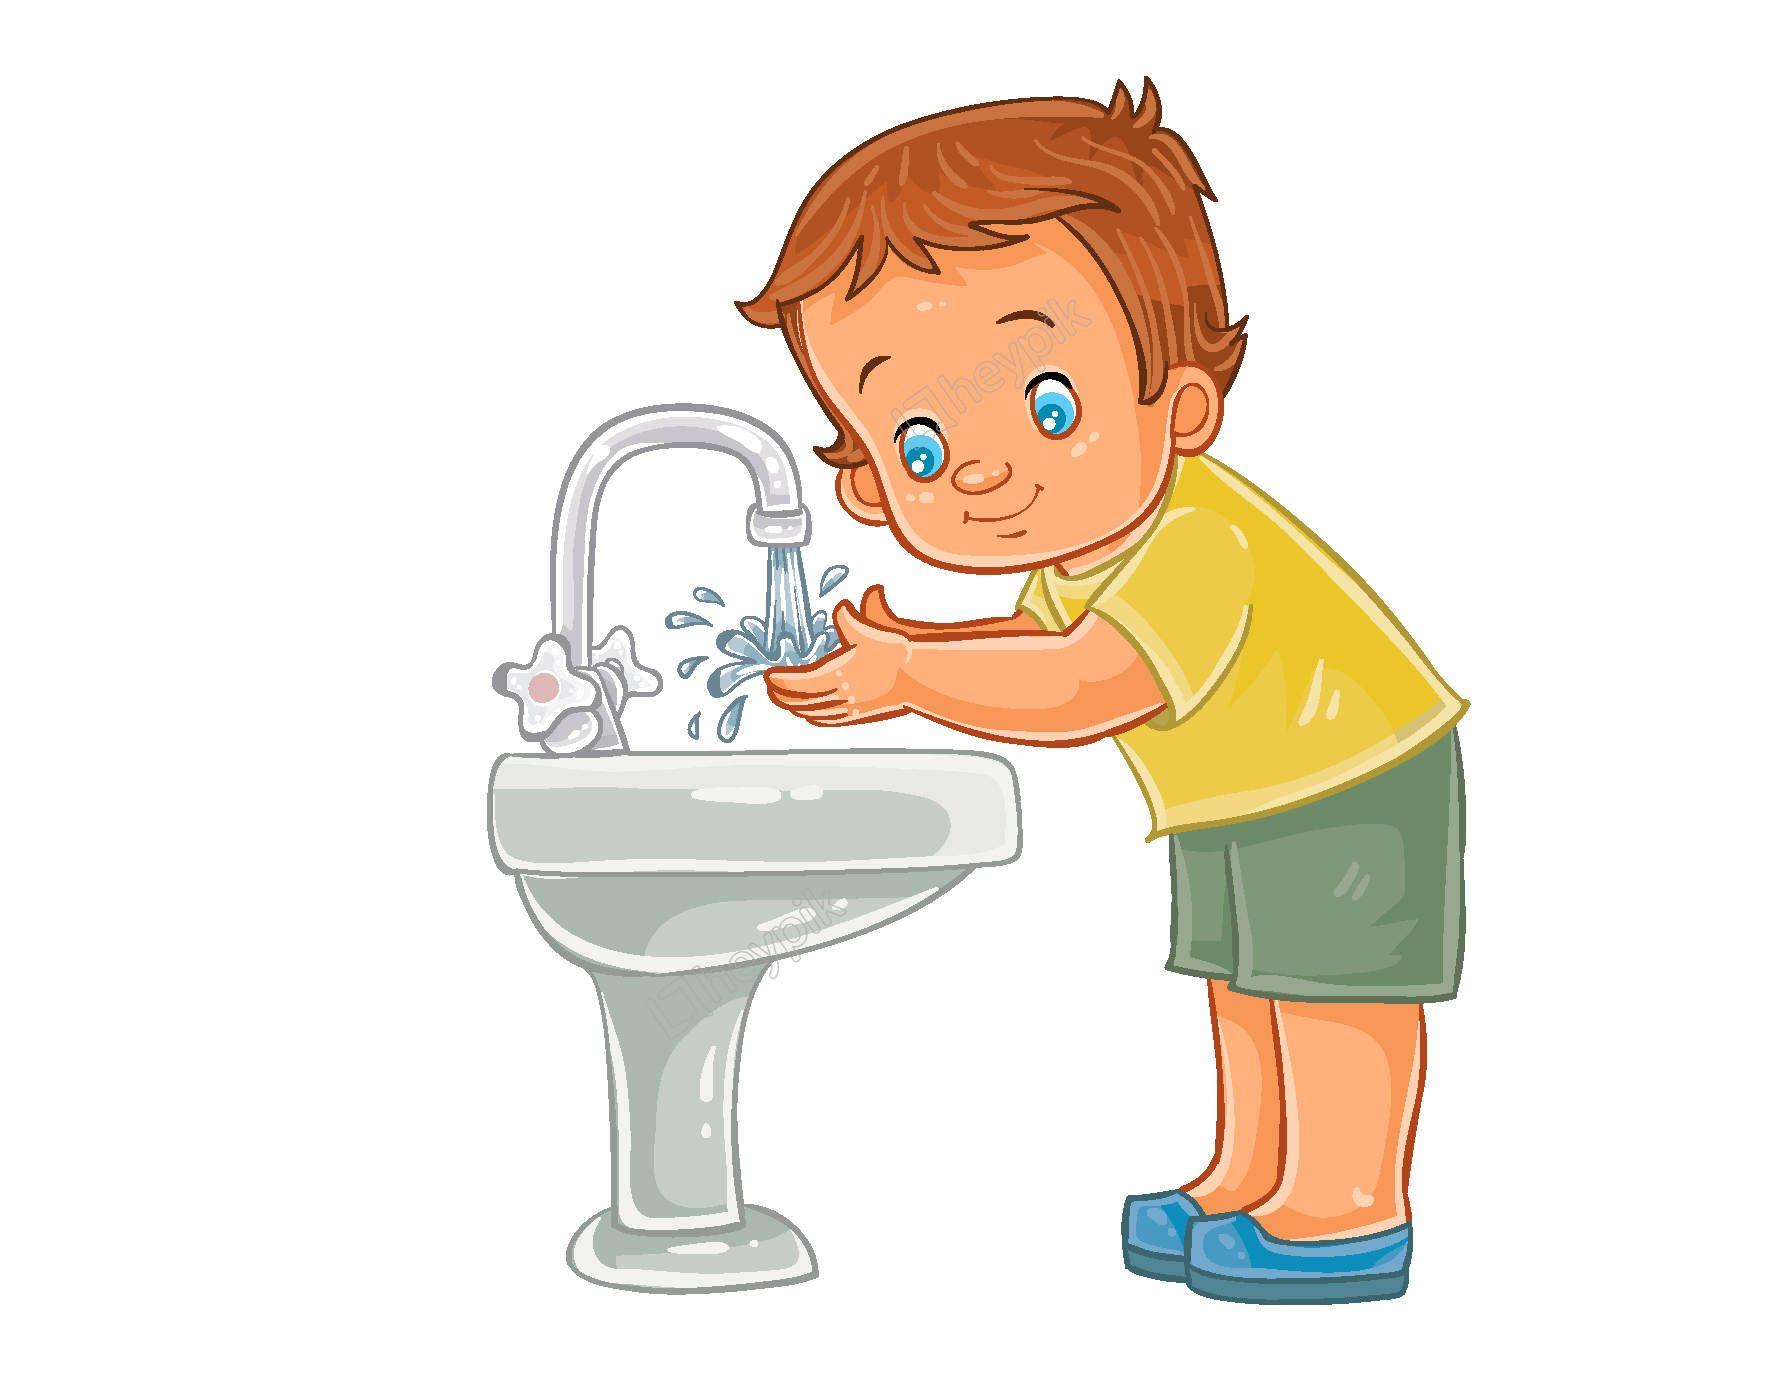 Hand Draw Cartoon Characters Wash Their Hands Hygiene